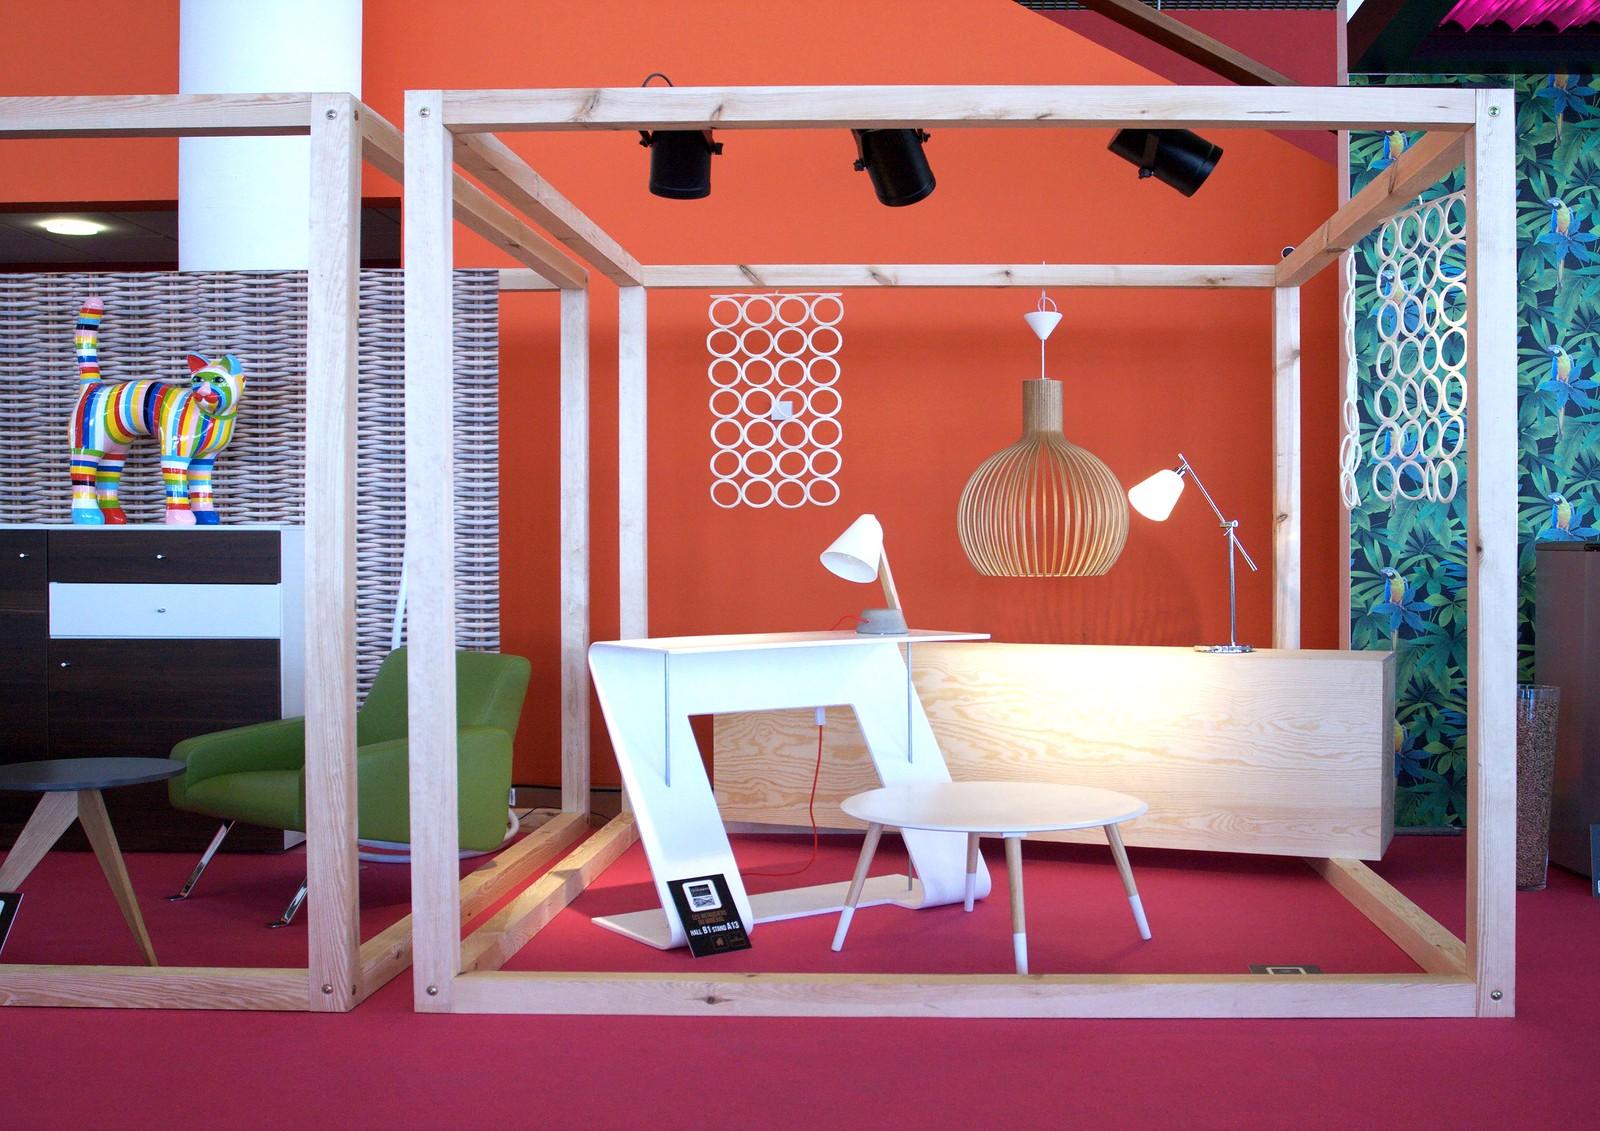 Salon de l'Habitat – 2015